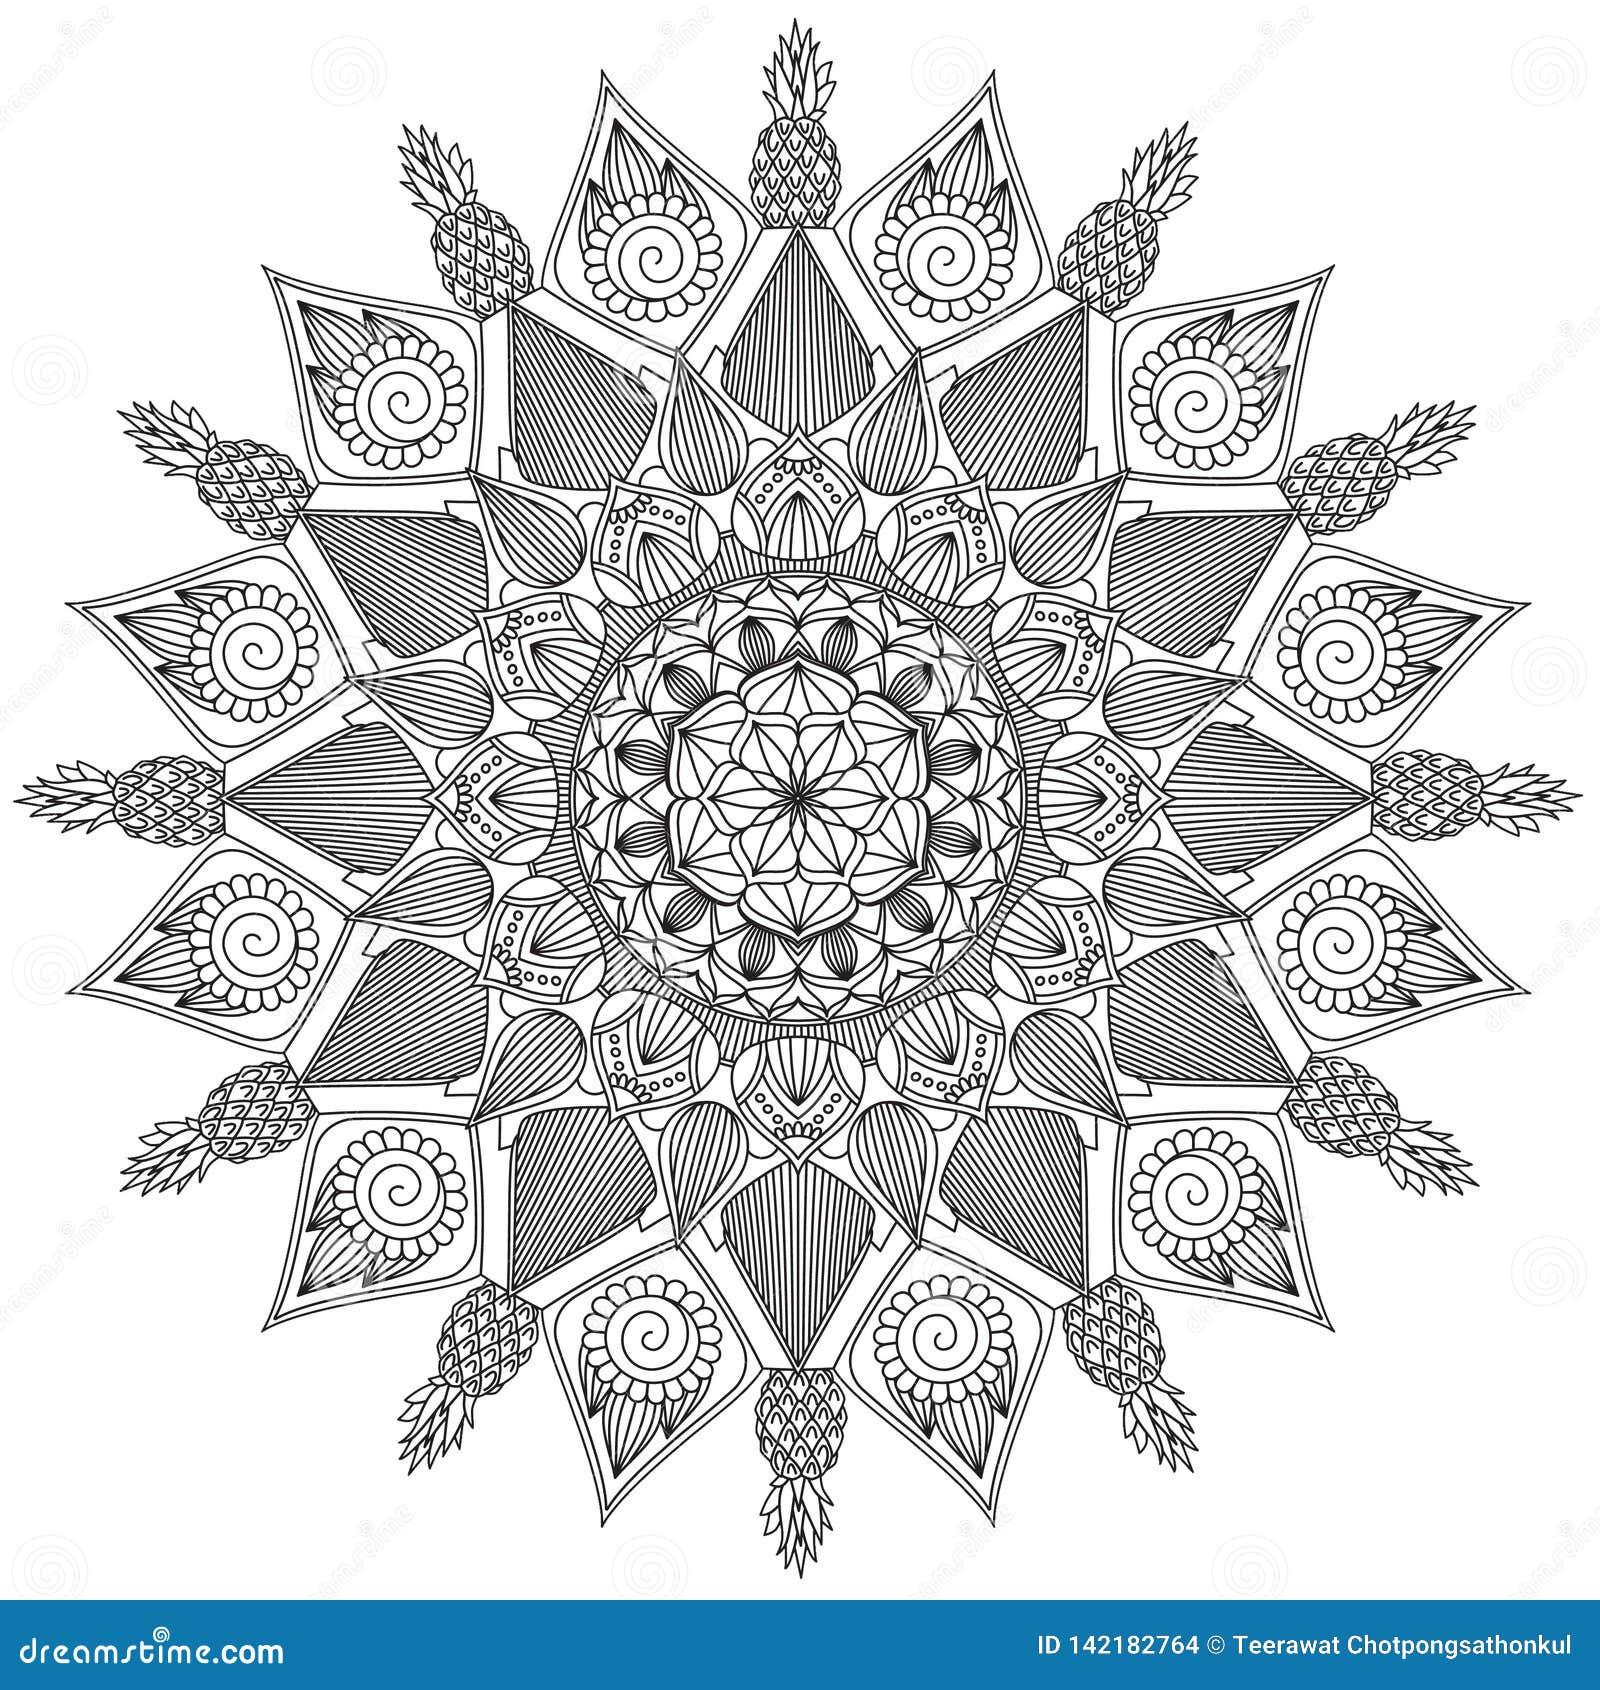 Mandala Intricate Patterns Black och vitt bra lynne